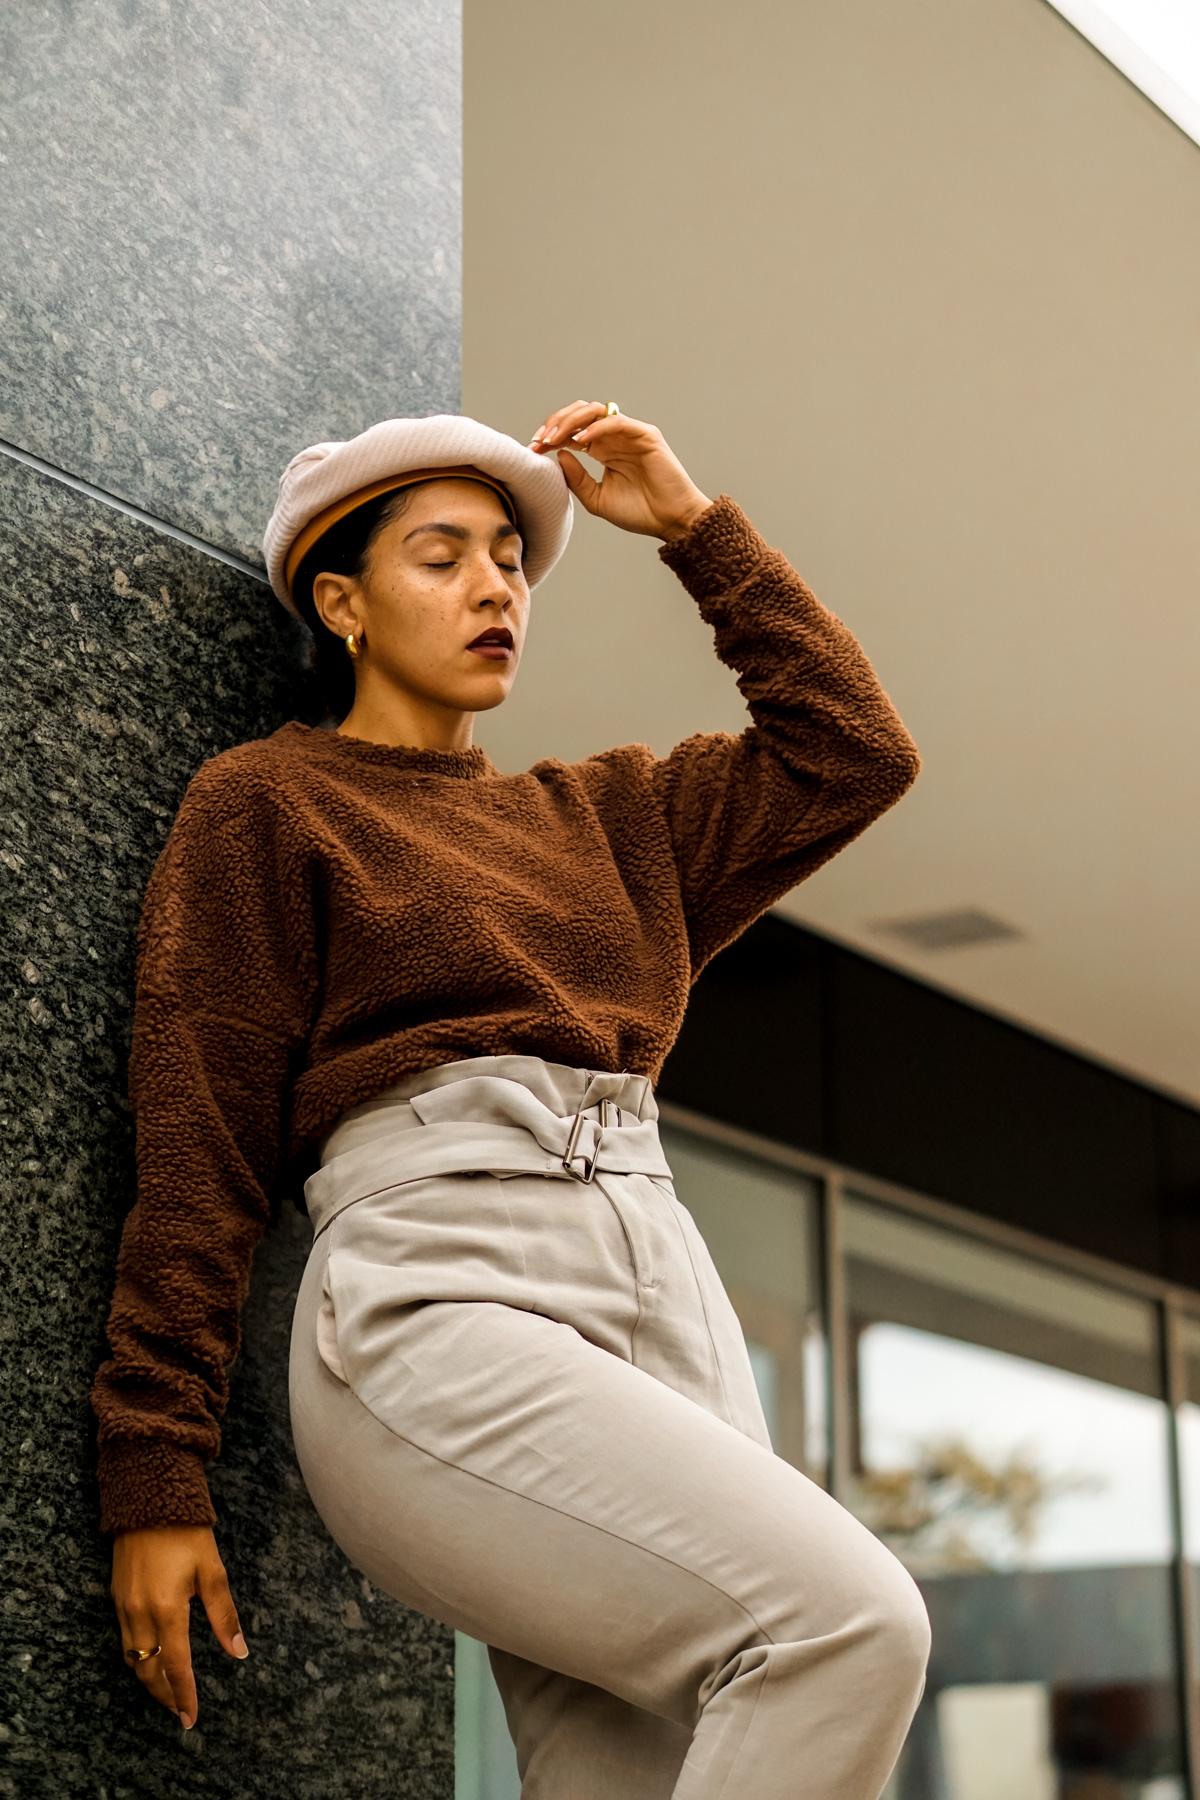 teddy sweatshirt outfit idea for women, chic fall outfit ideas for women, black fashion bloggers inspiration, teddy sweatshirt outfit idea black girl